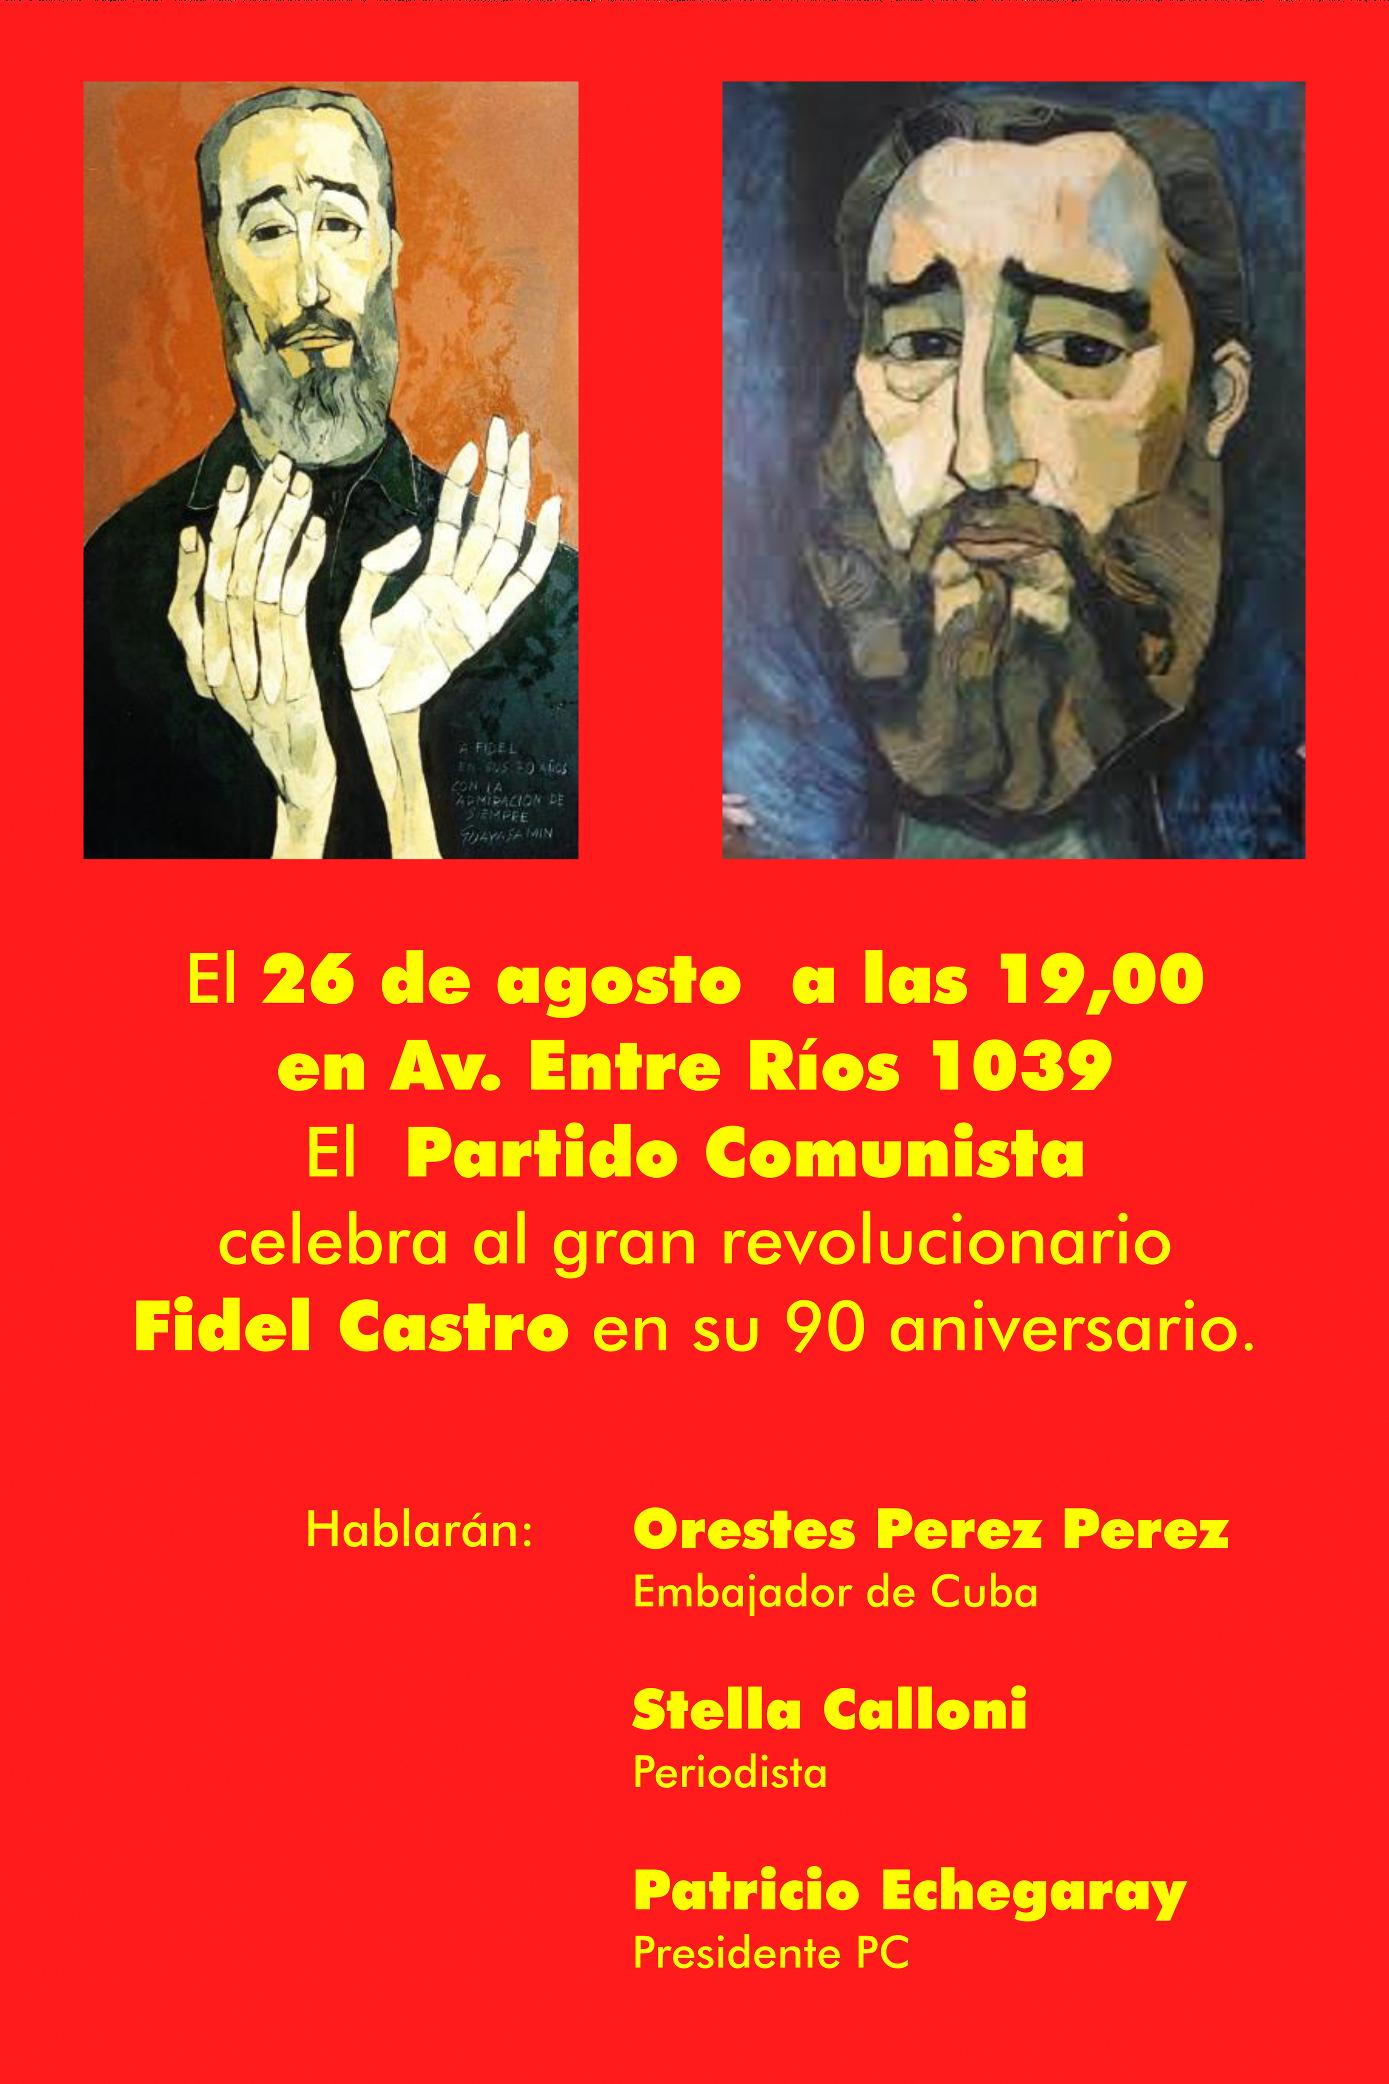 90 aniversario de Fidel